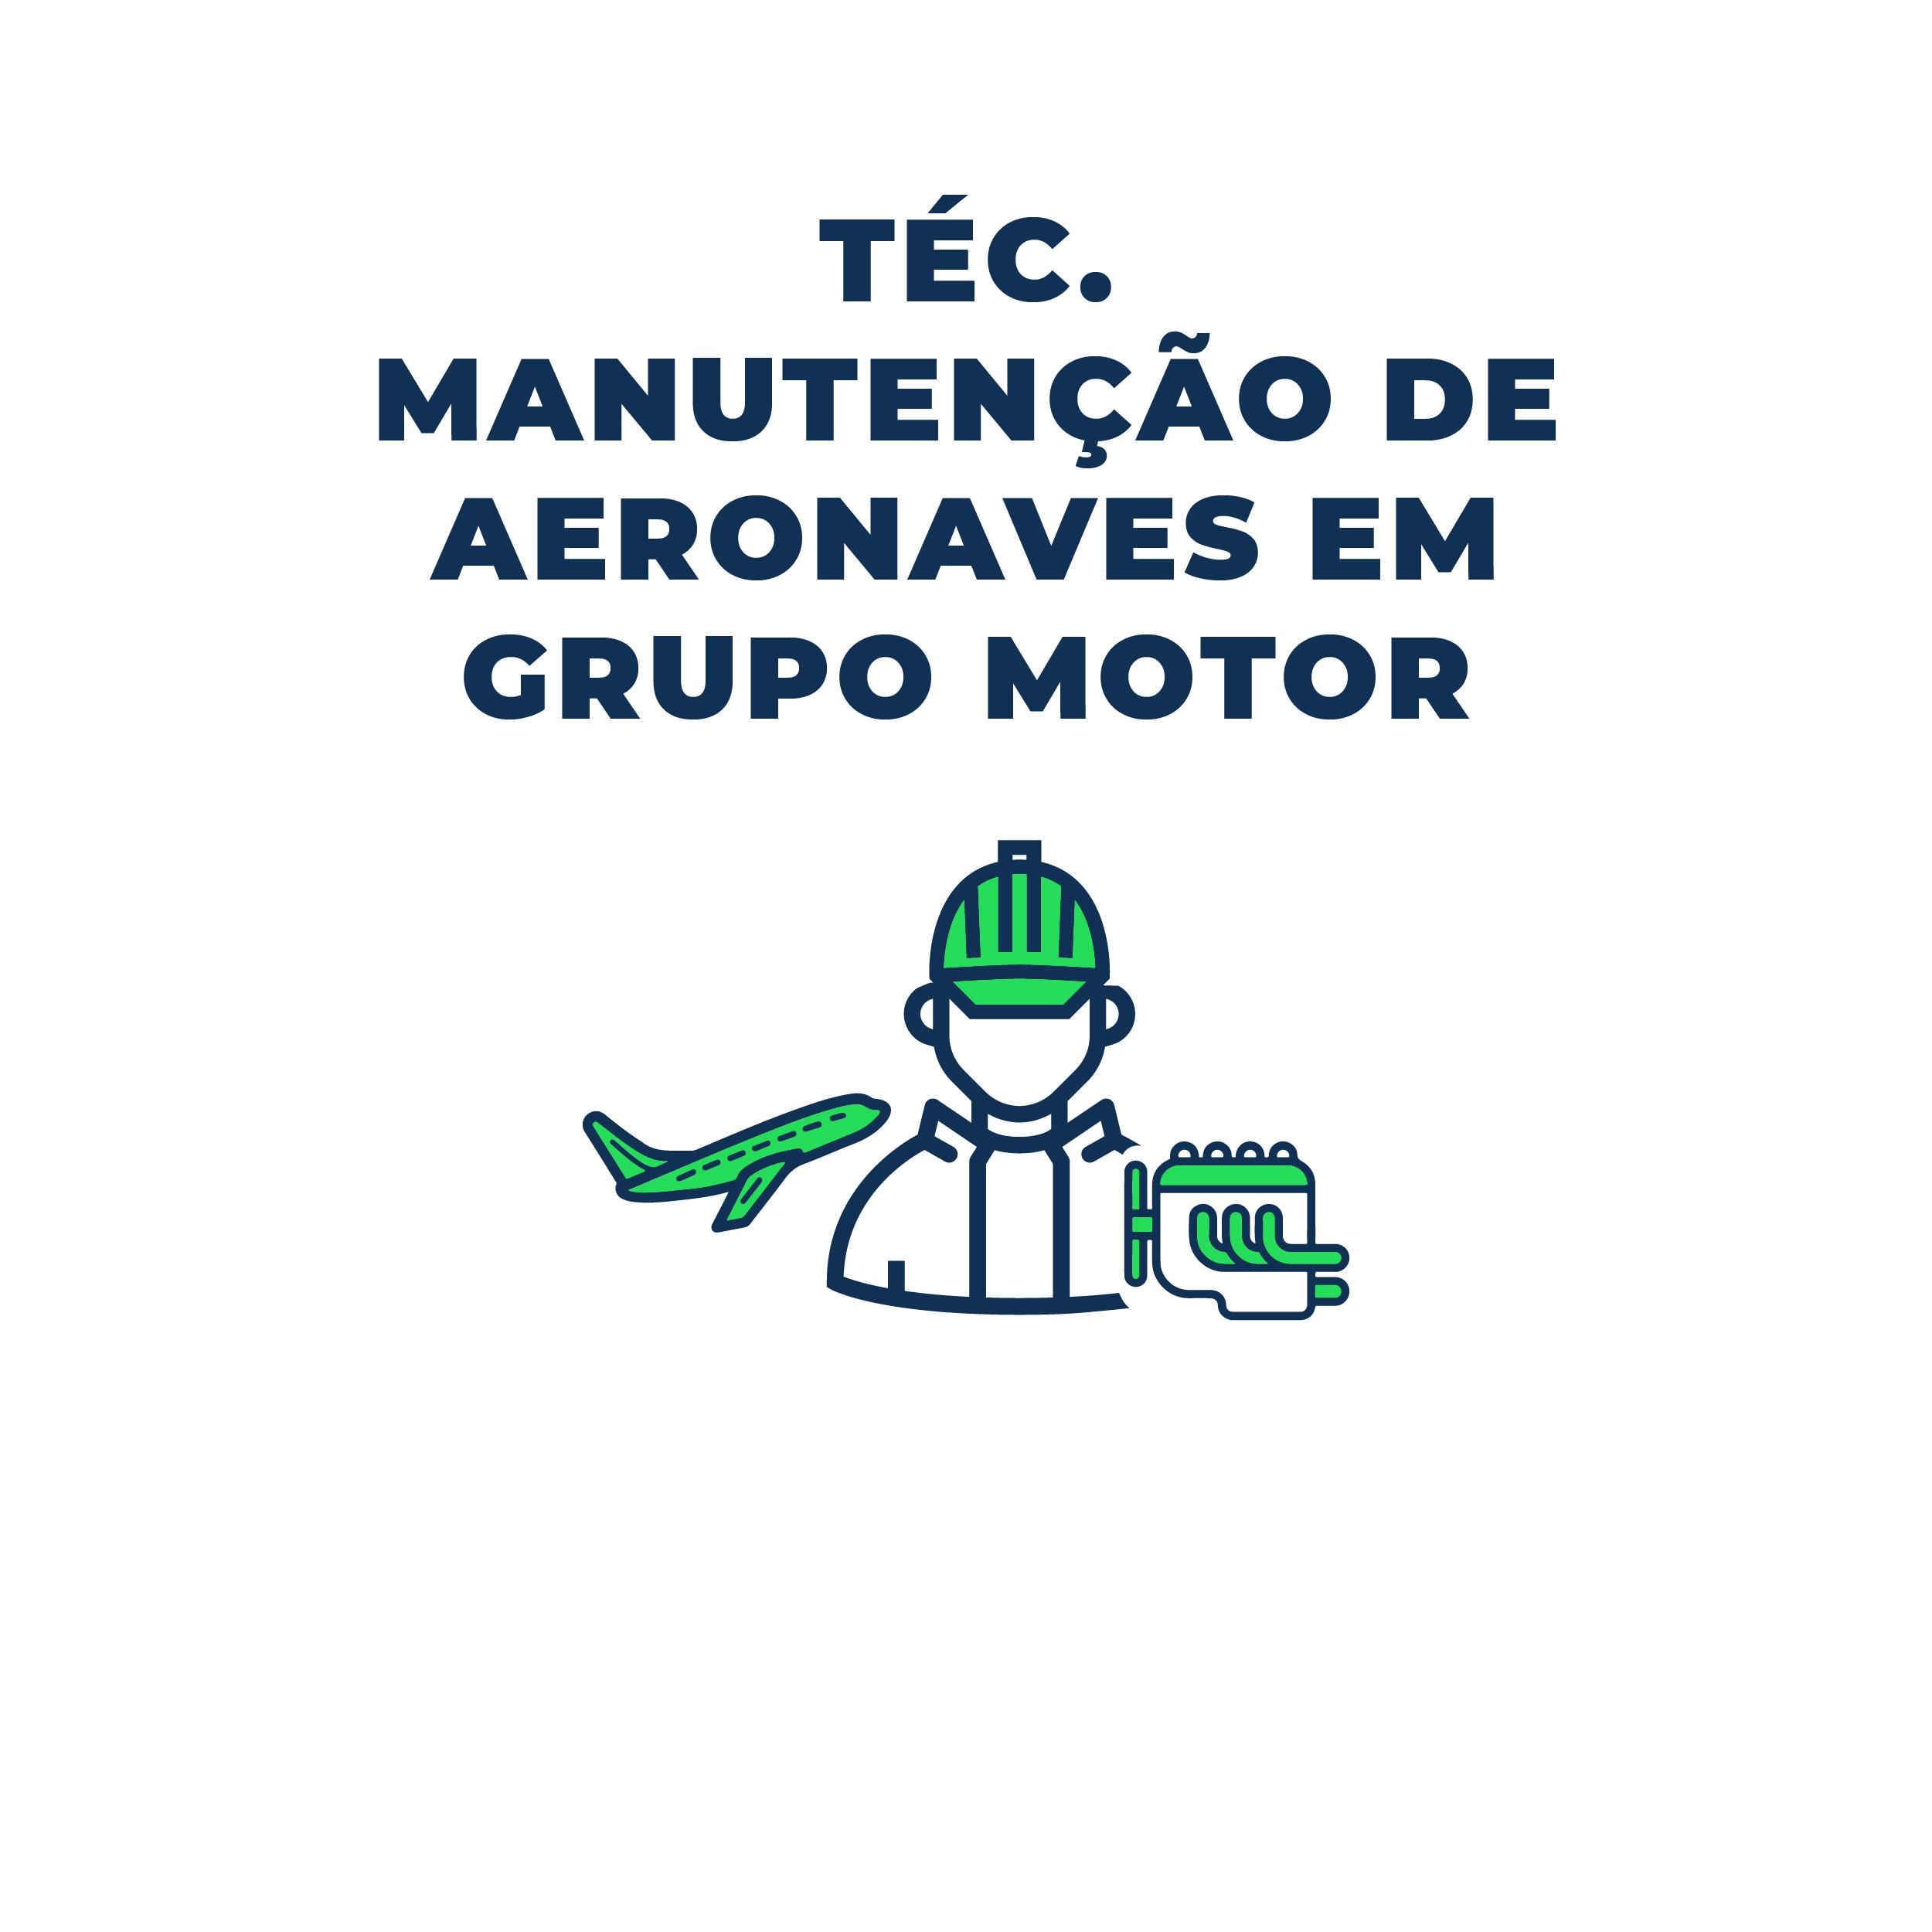 manutencao grupo motoro